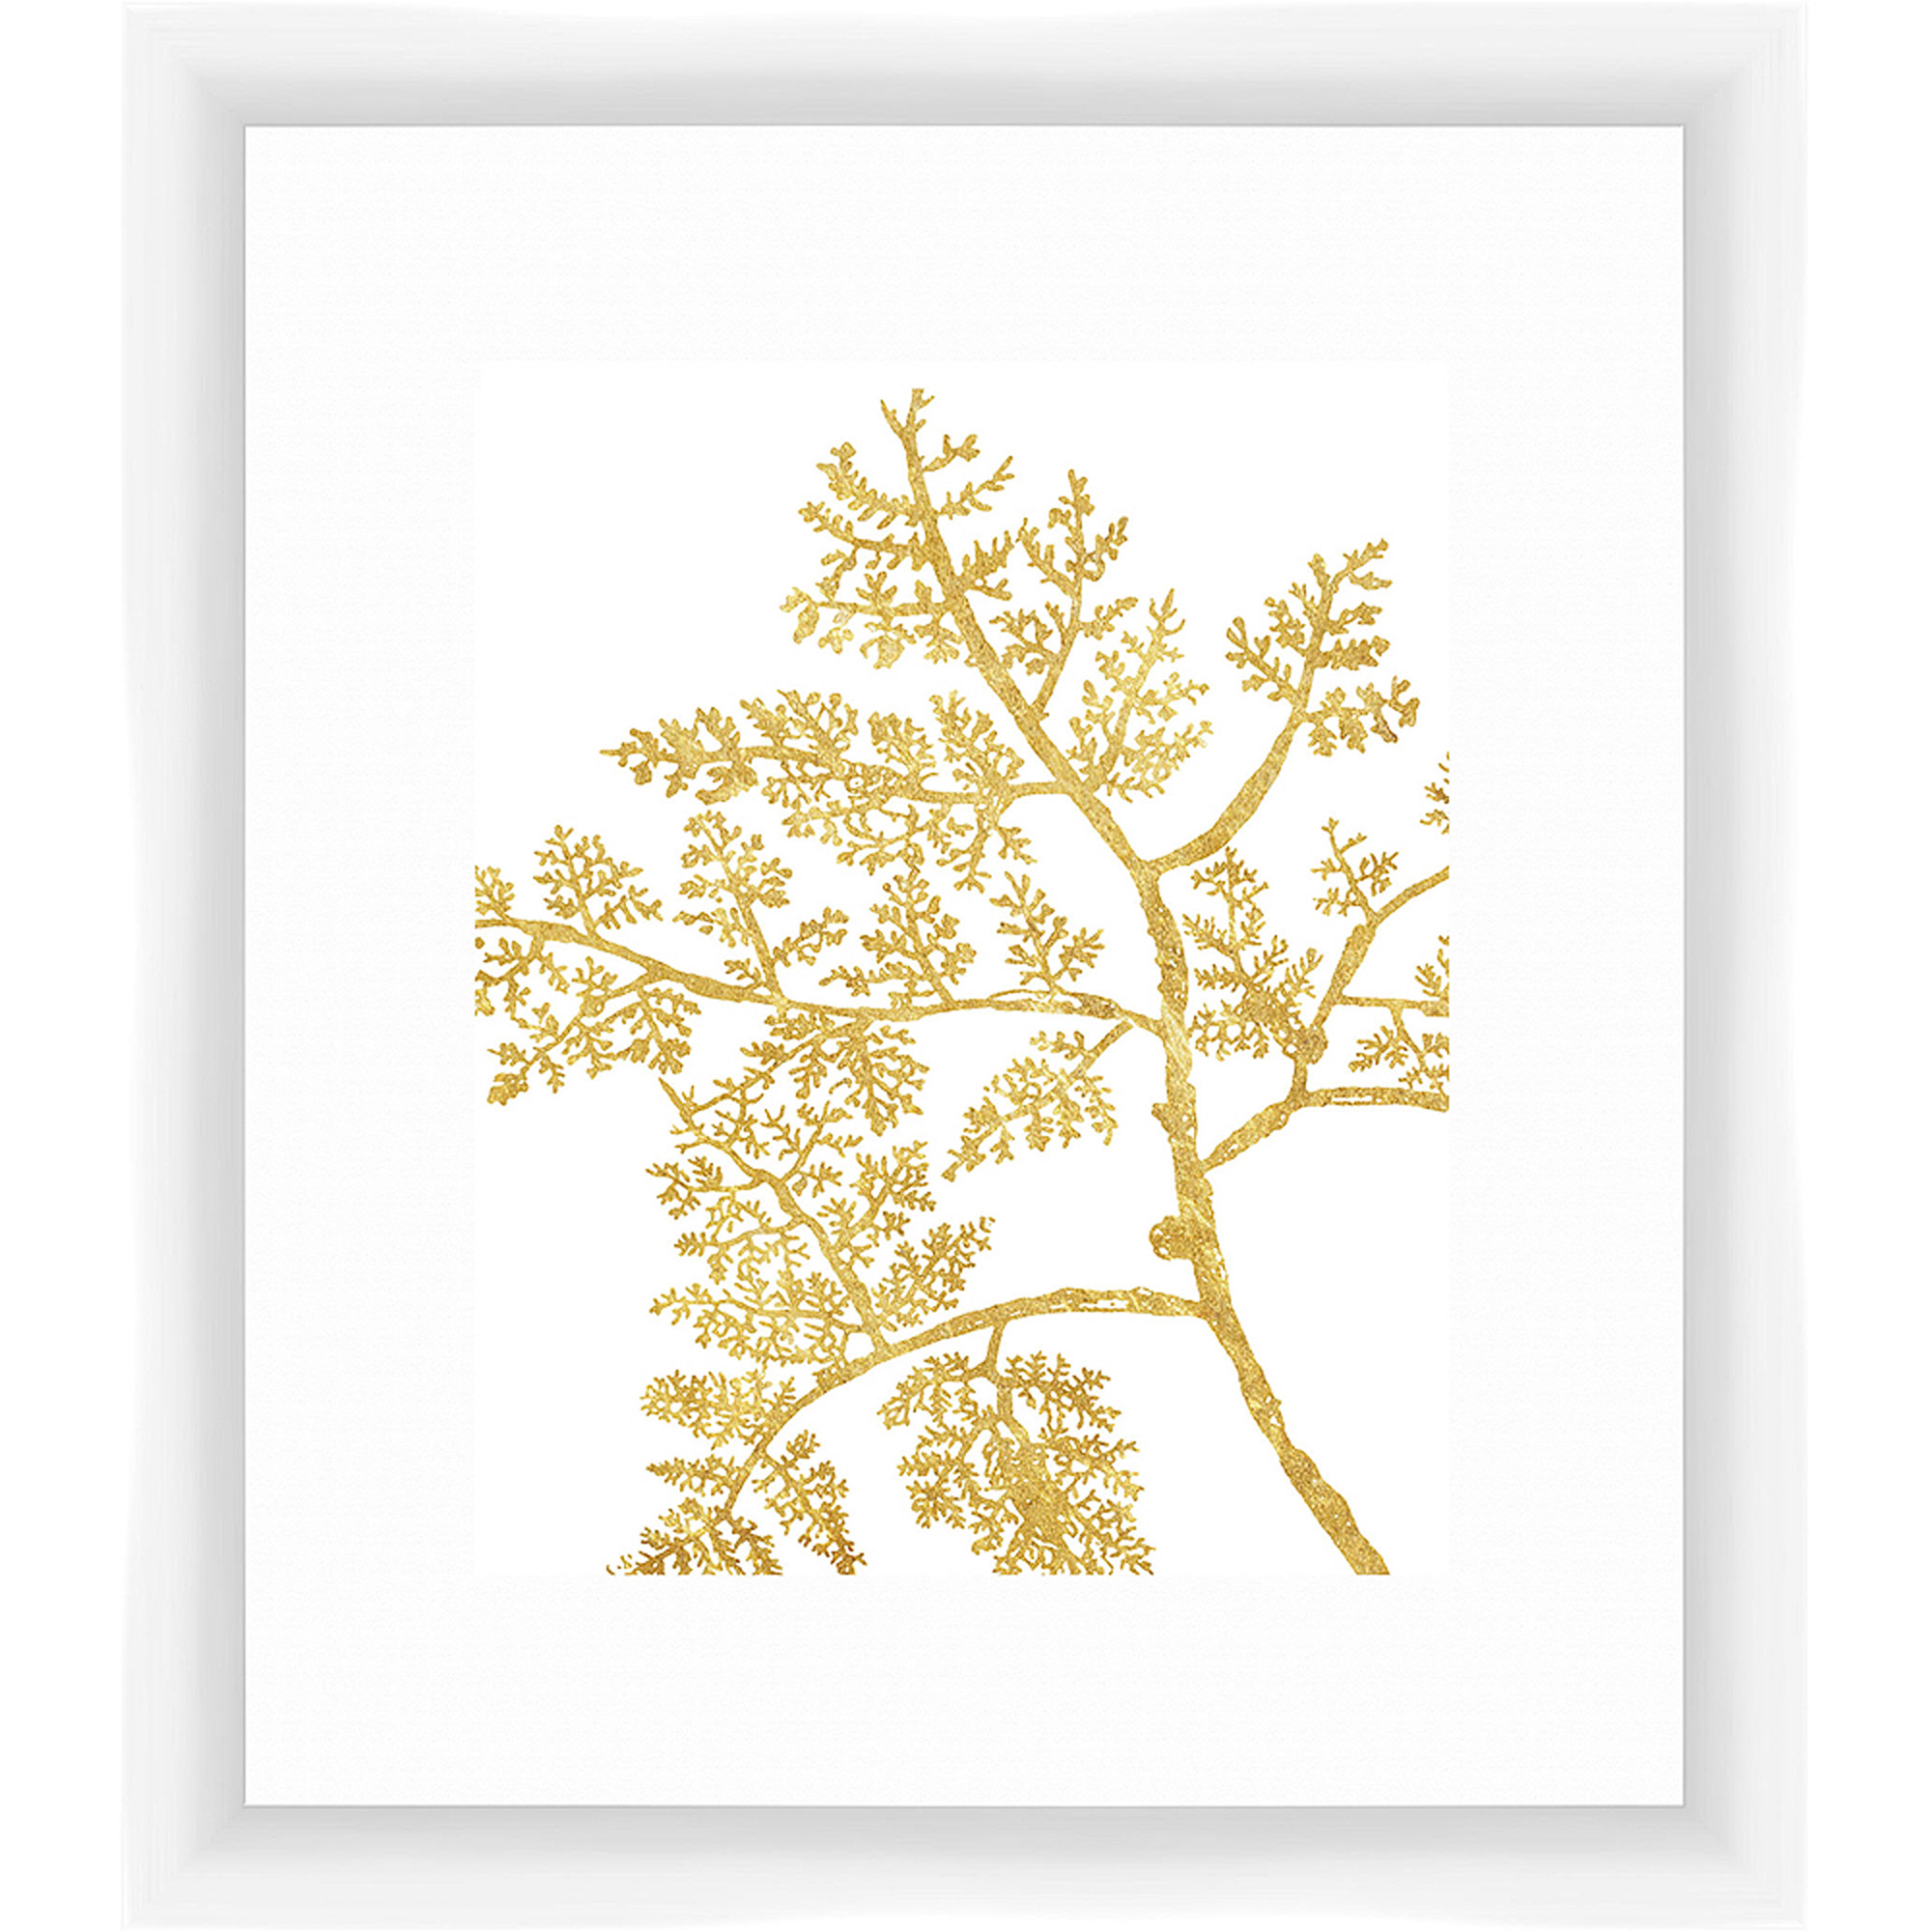 Golden Elements II Wall Art, 14x16